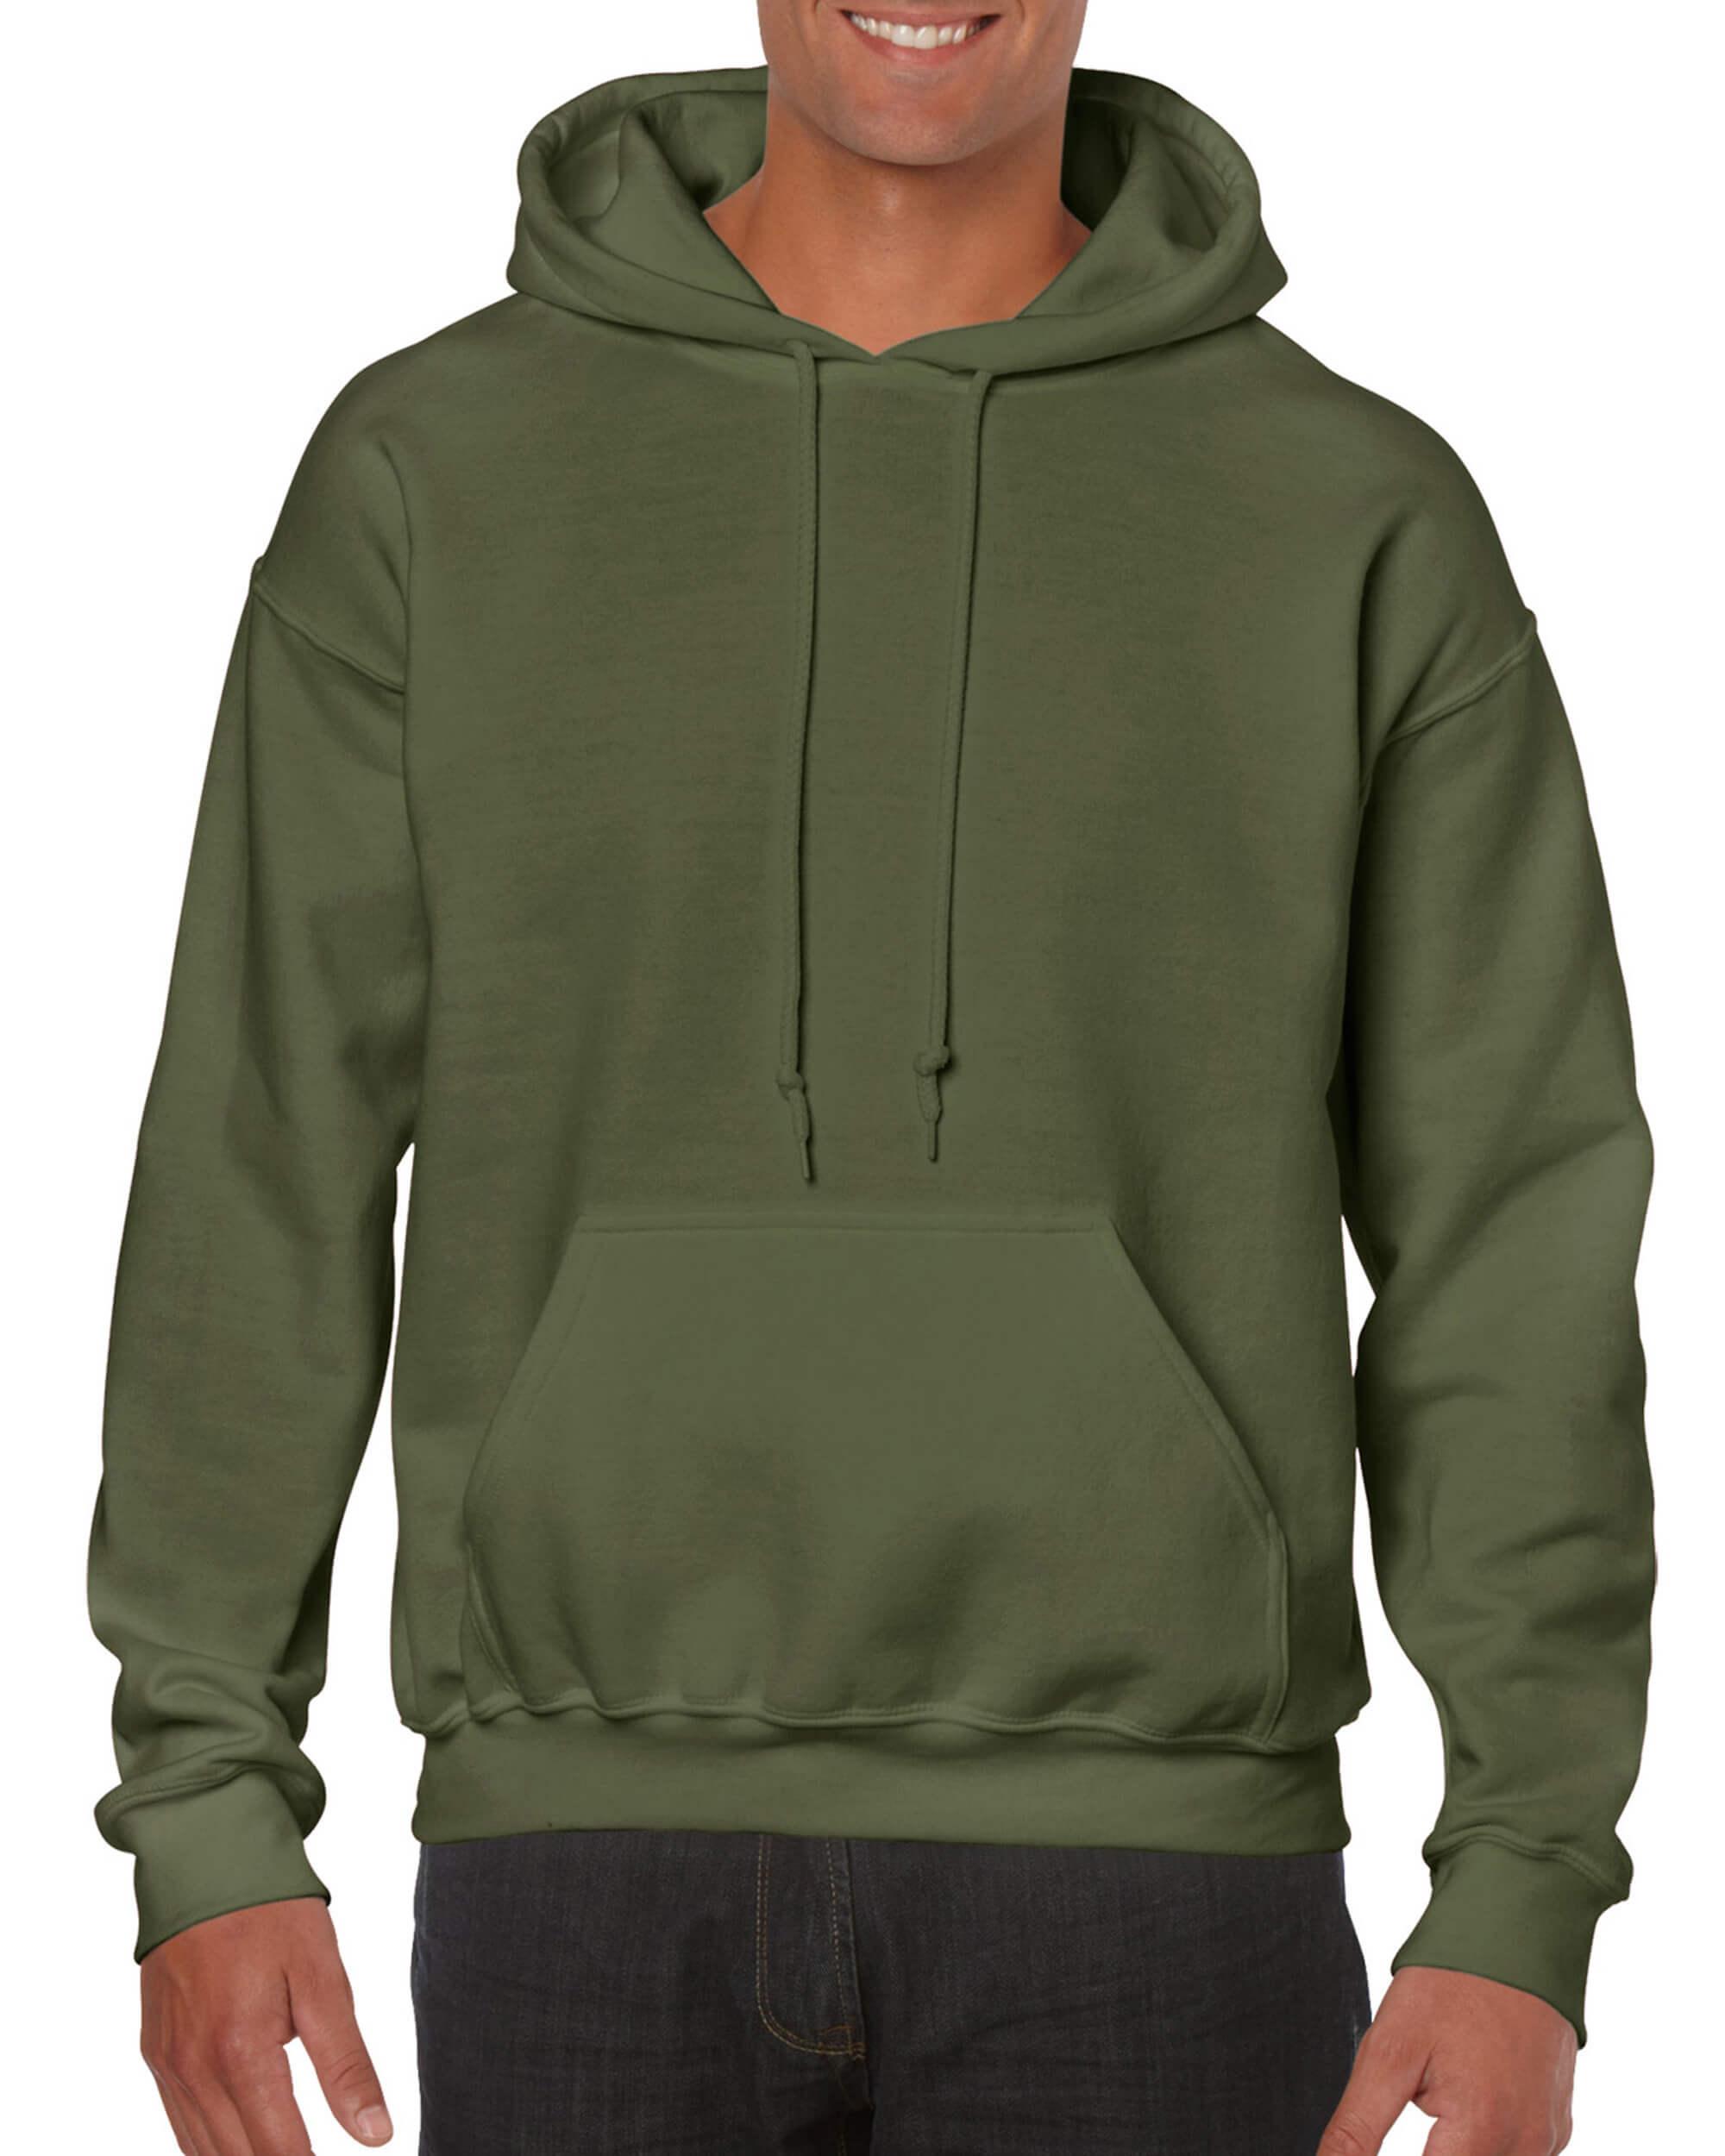 7b103b62 Military Green Pullover Hoodie • T-Shirt Explosion